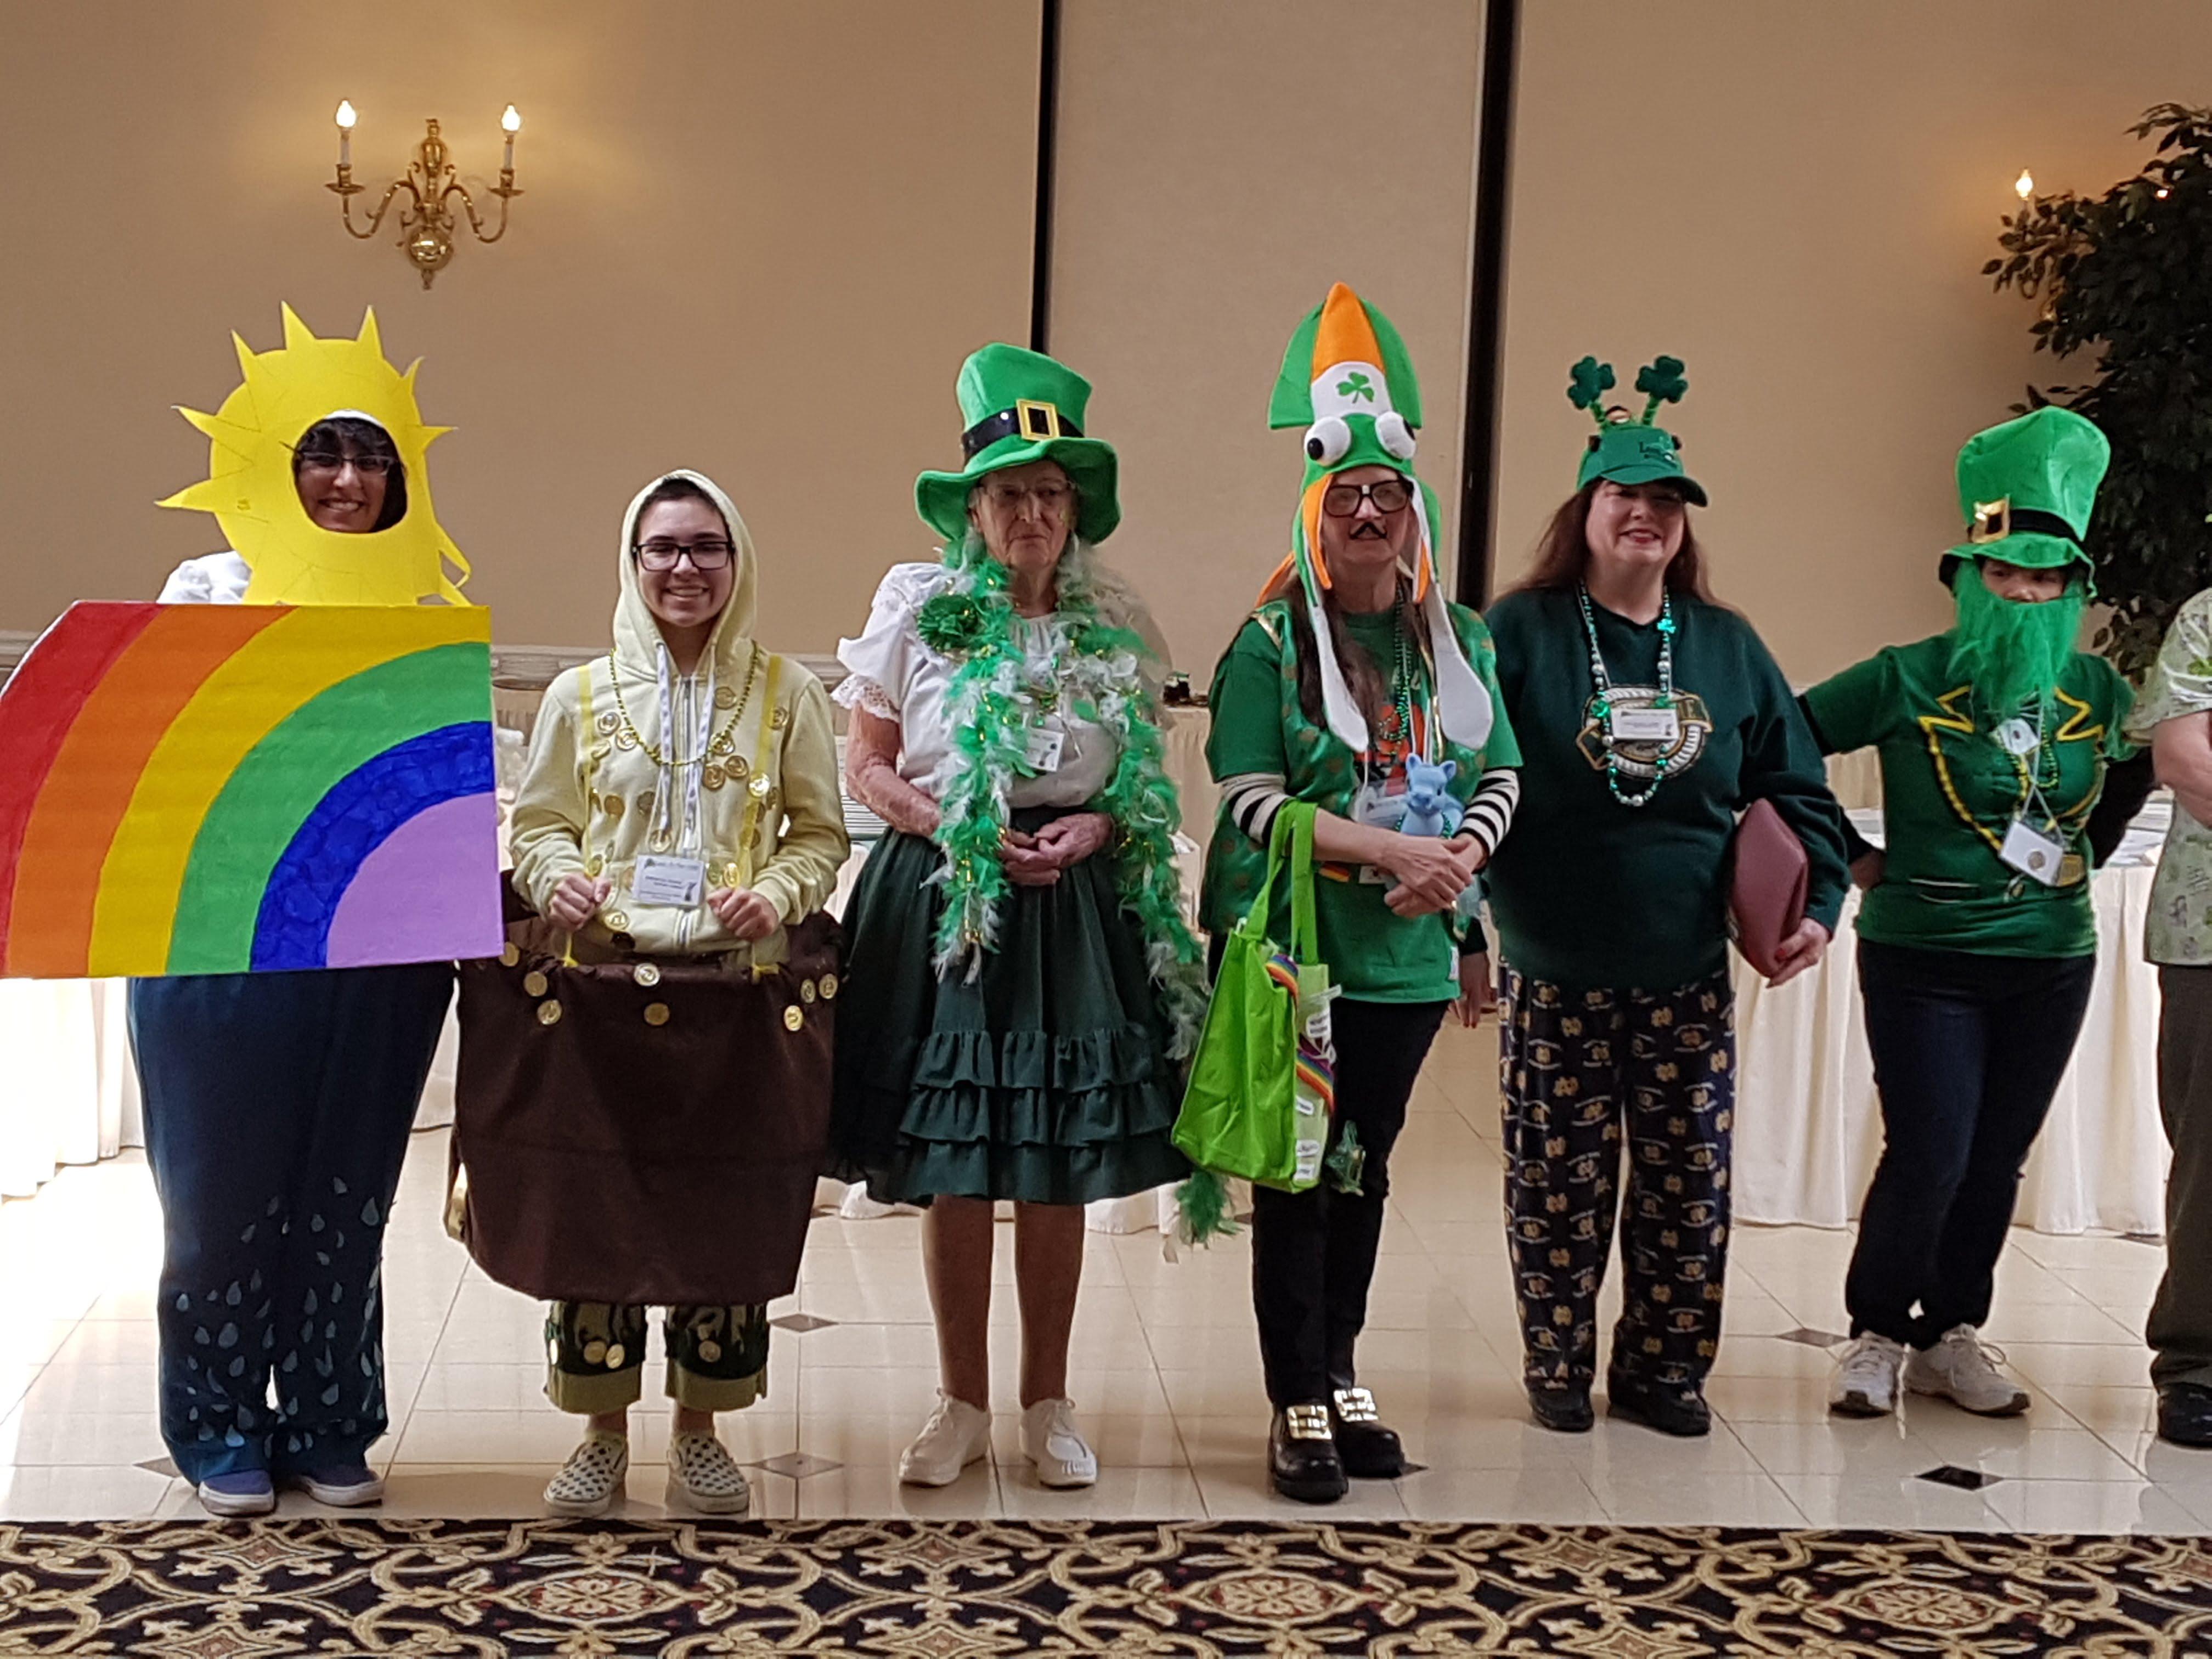 Costume contest entrants.